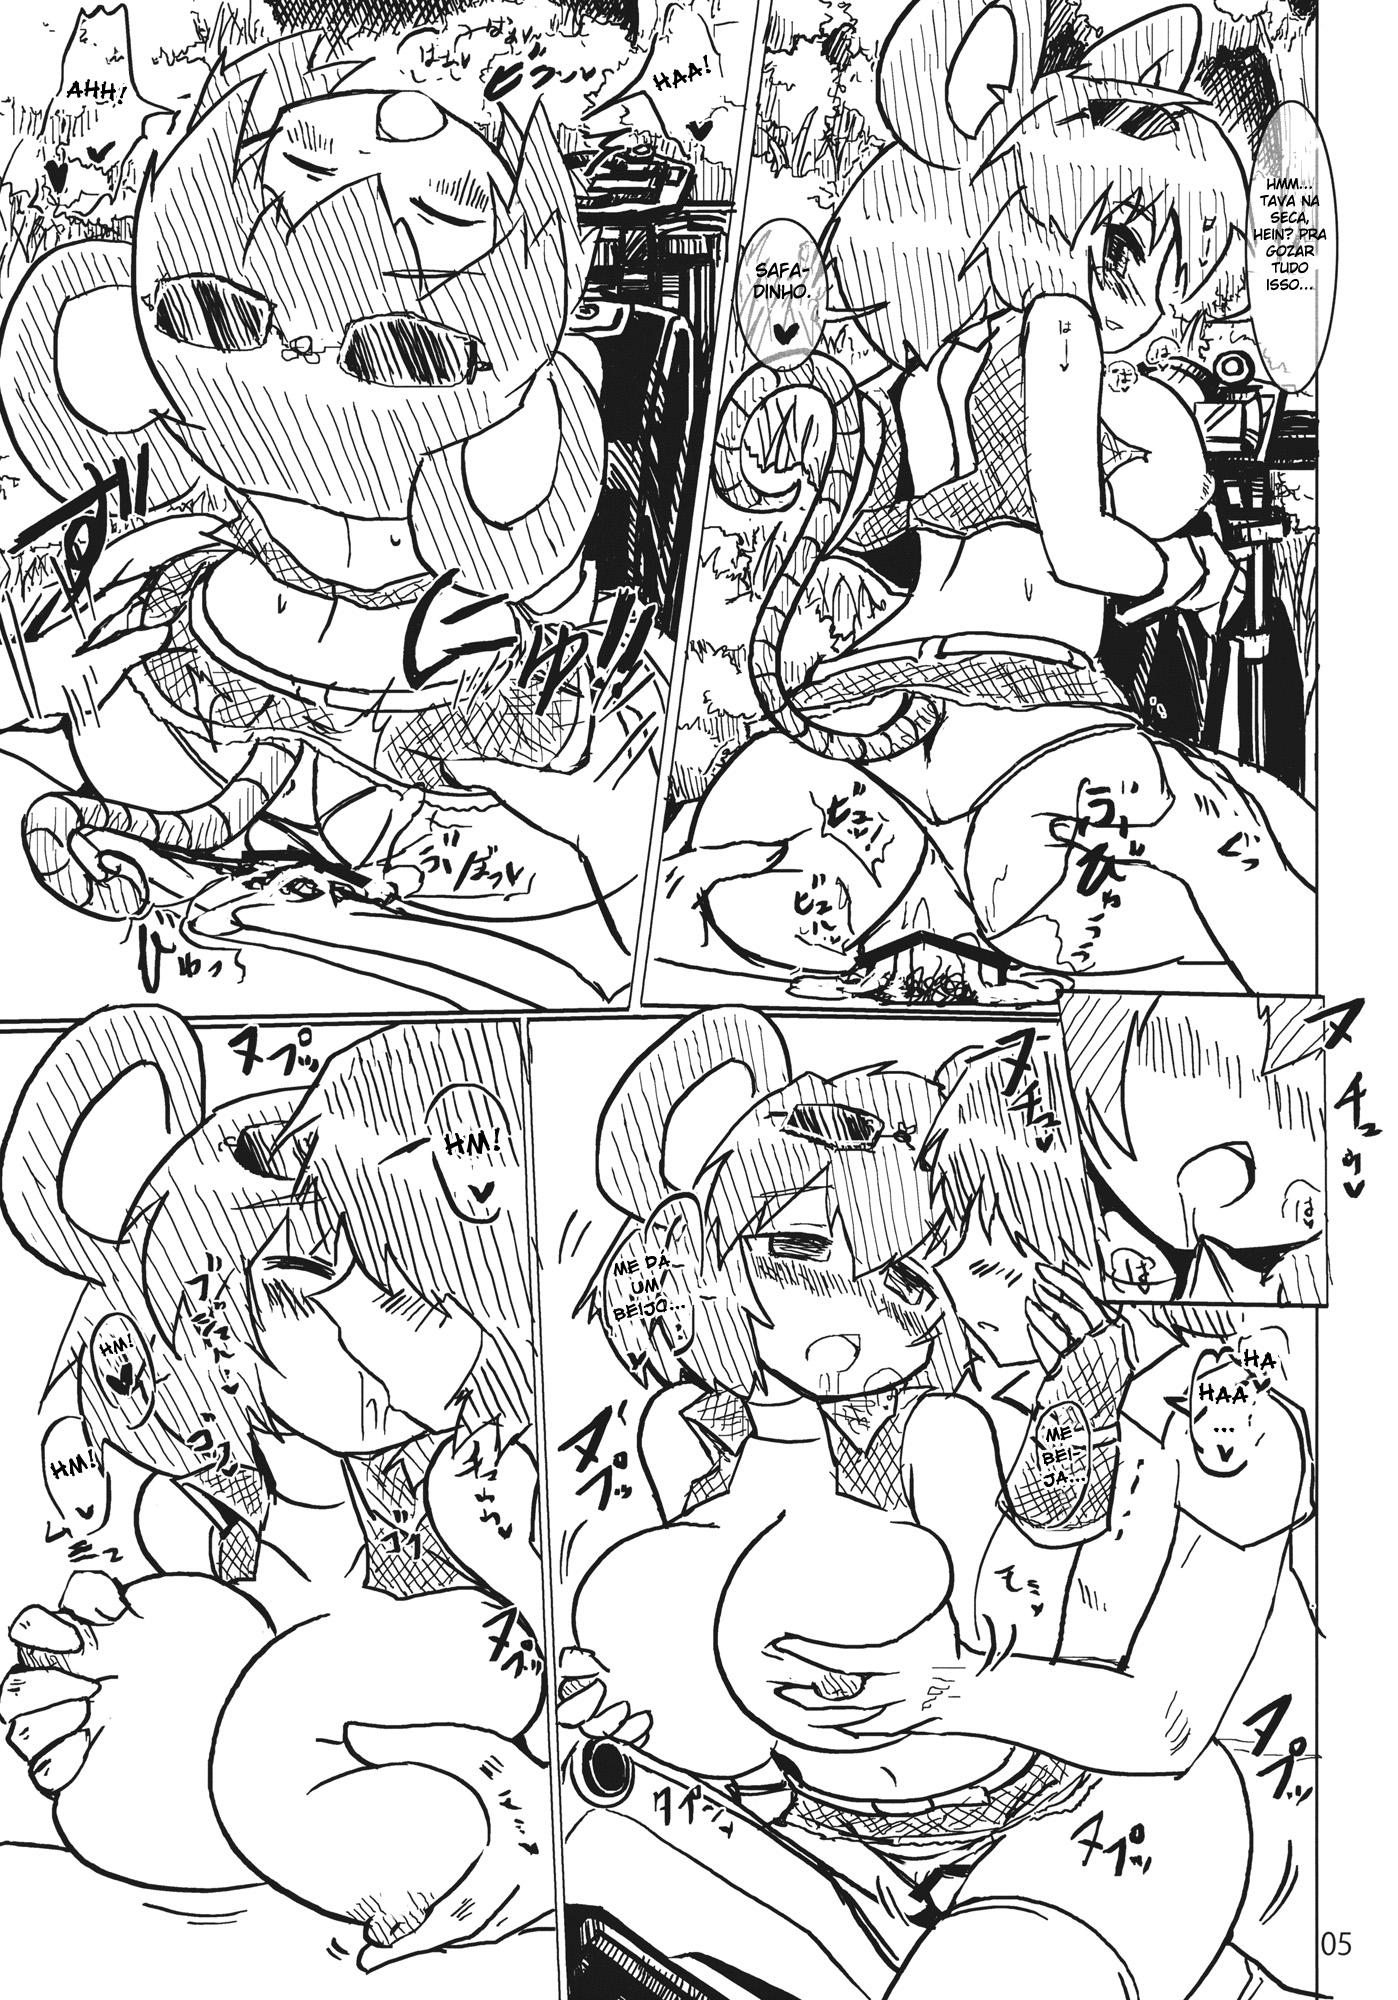 Touhou Project Hentai: A ratinha traiçoeira - Foto 5